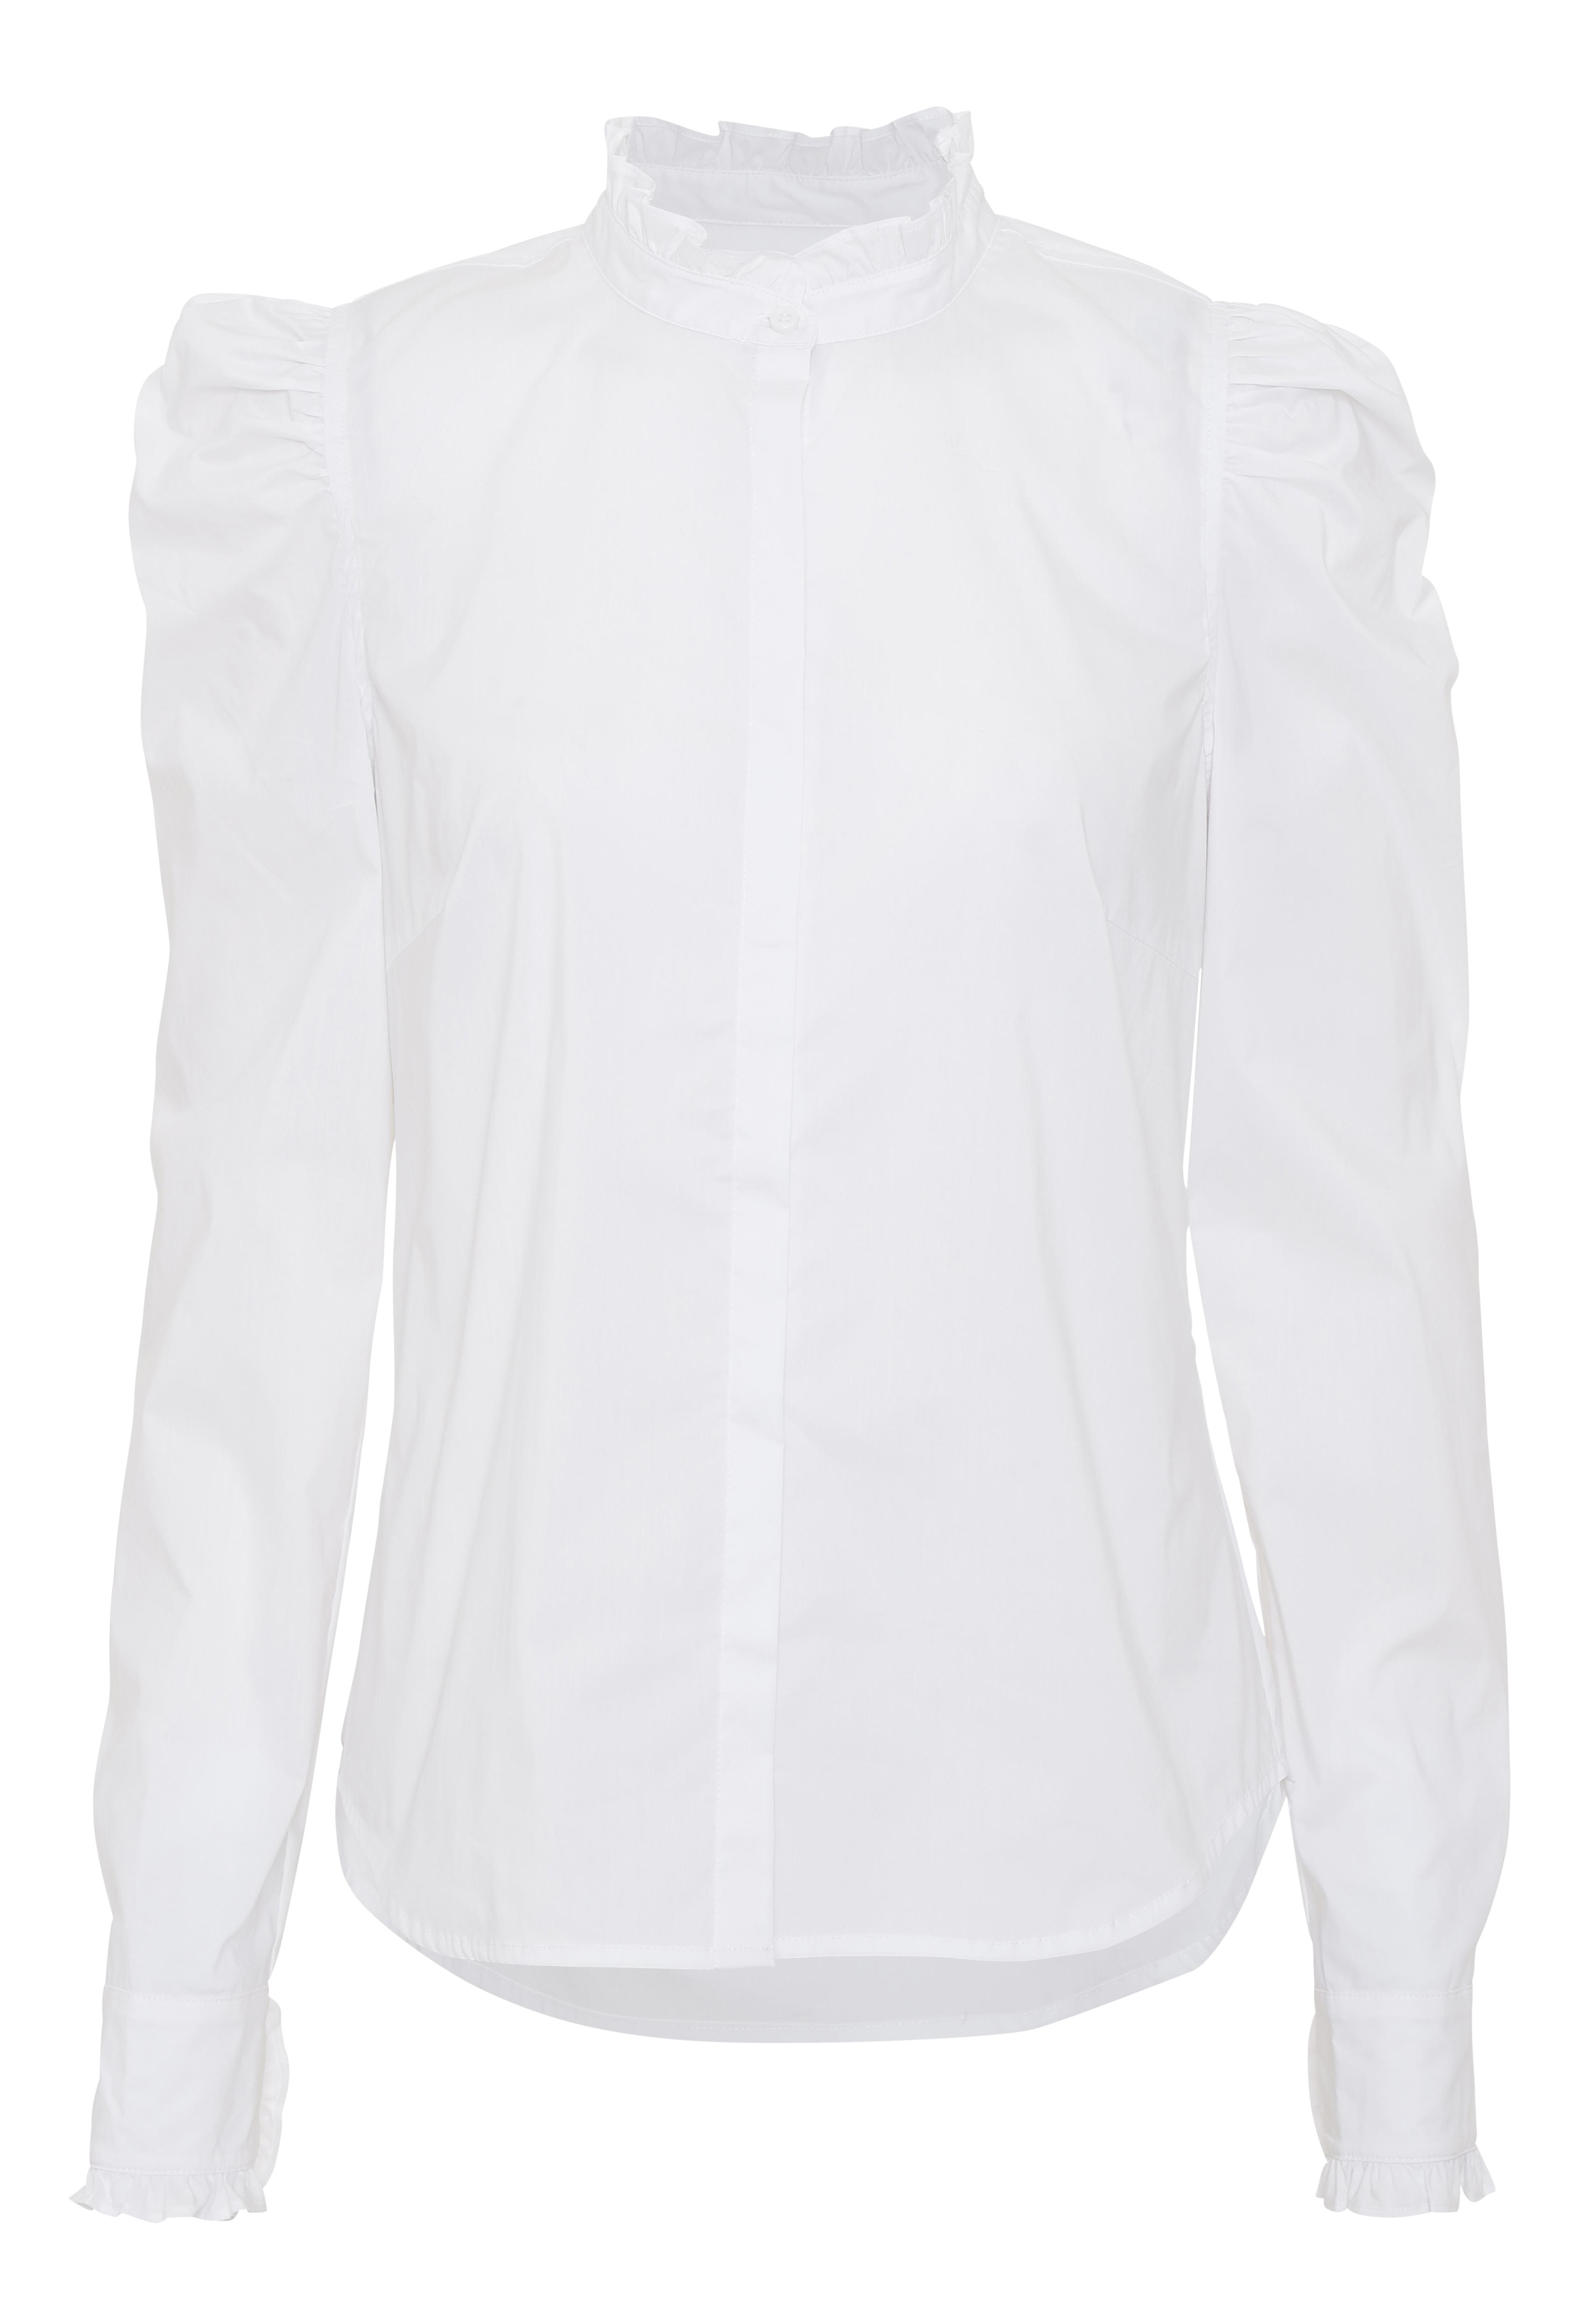 Custommade Hania Shirt White